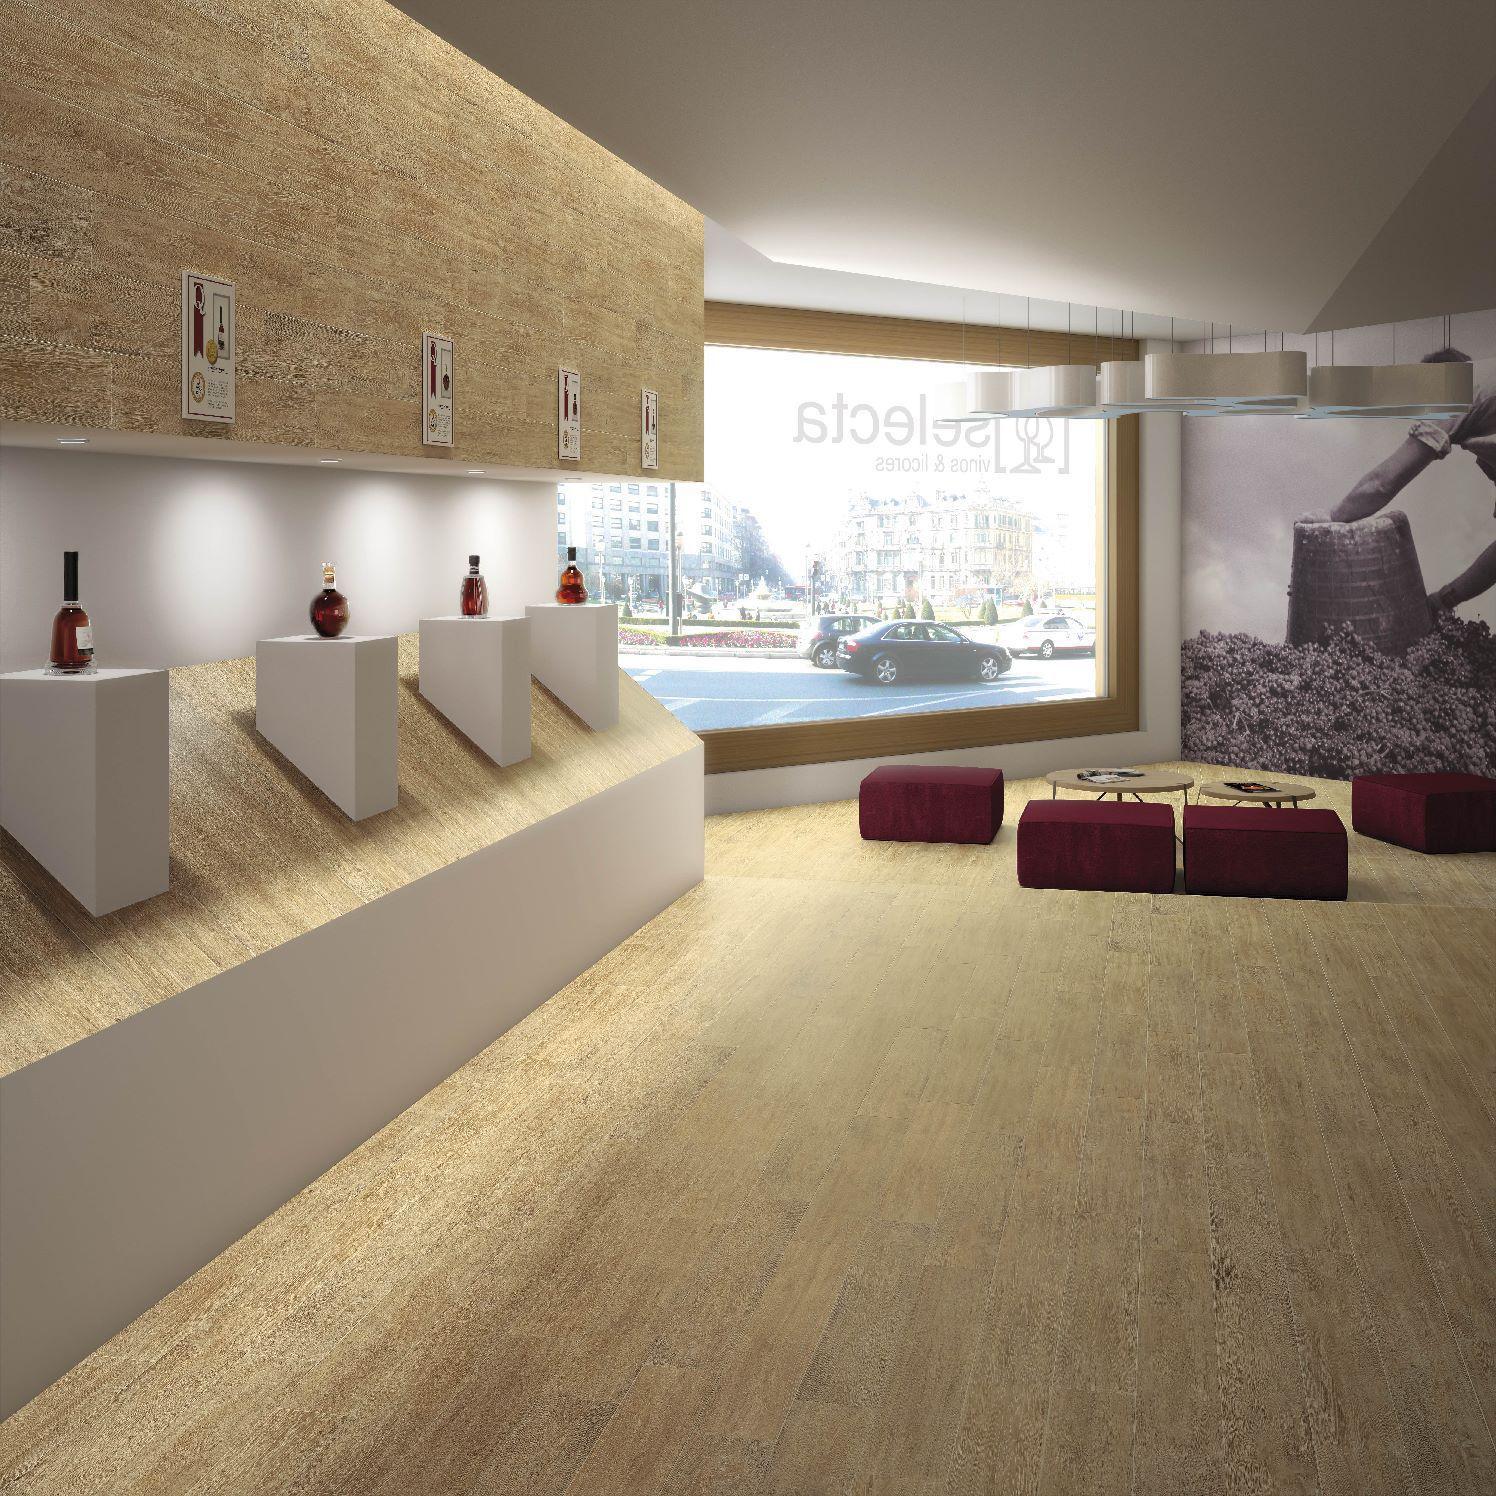 Indoor tile wall floor porcelain stoneware vancouver indoor tile wall floor porcelain stoneware vancouver dailygadgetfo Gallery